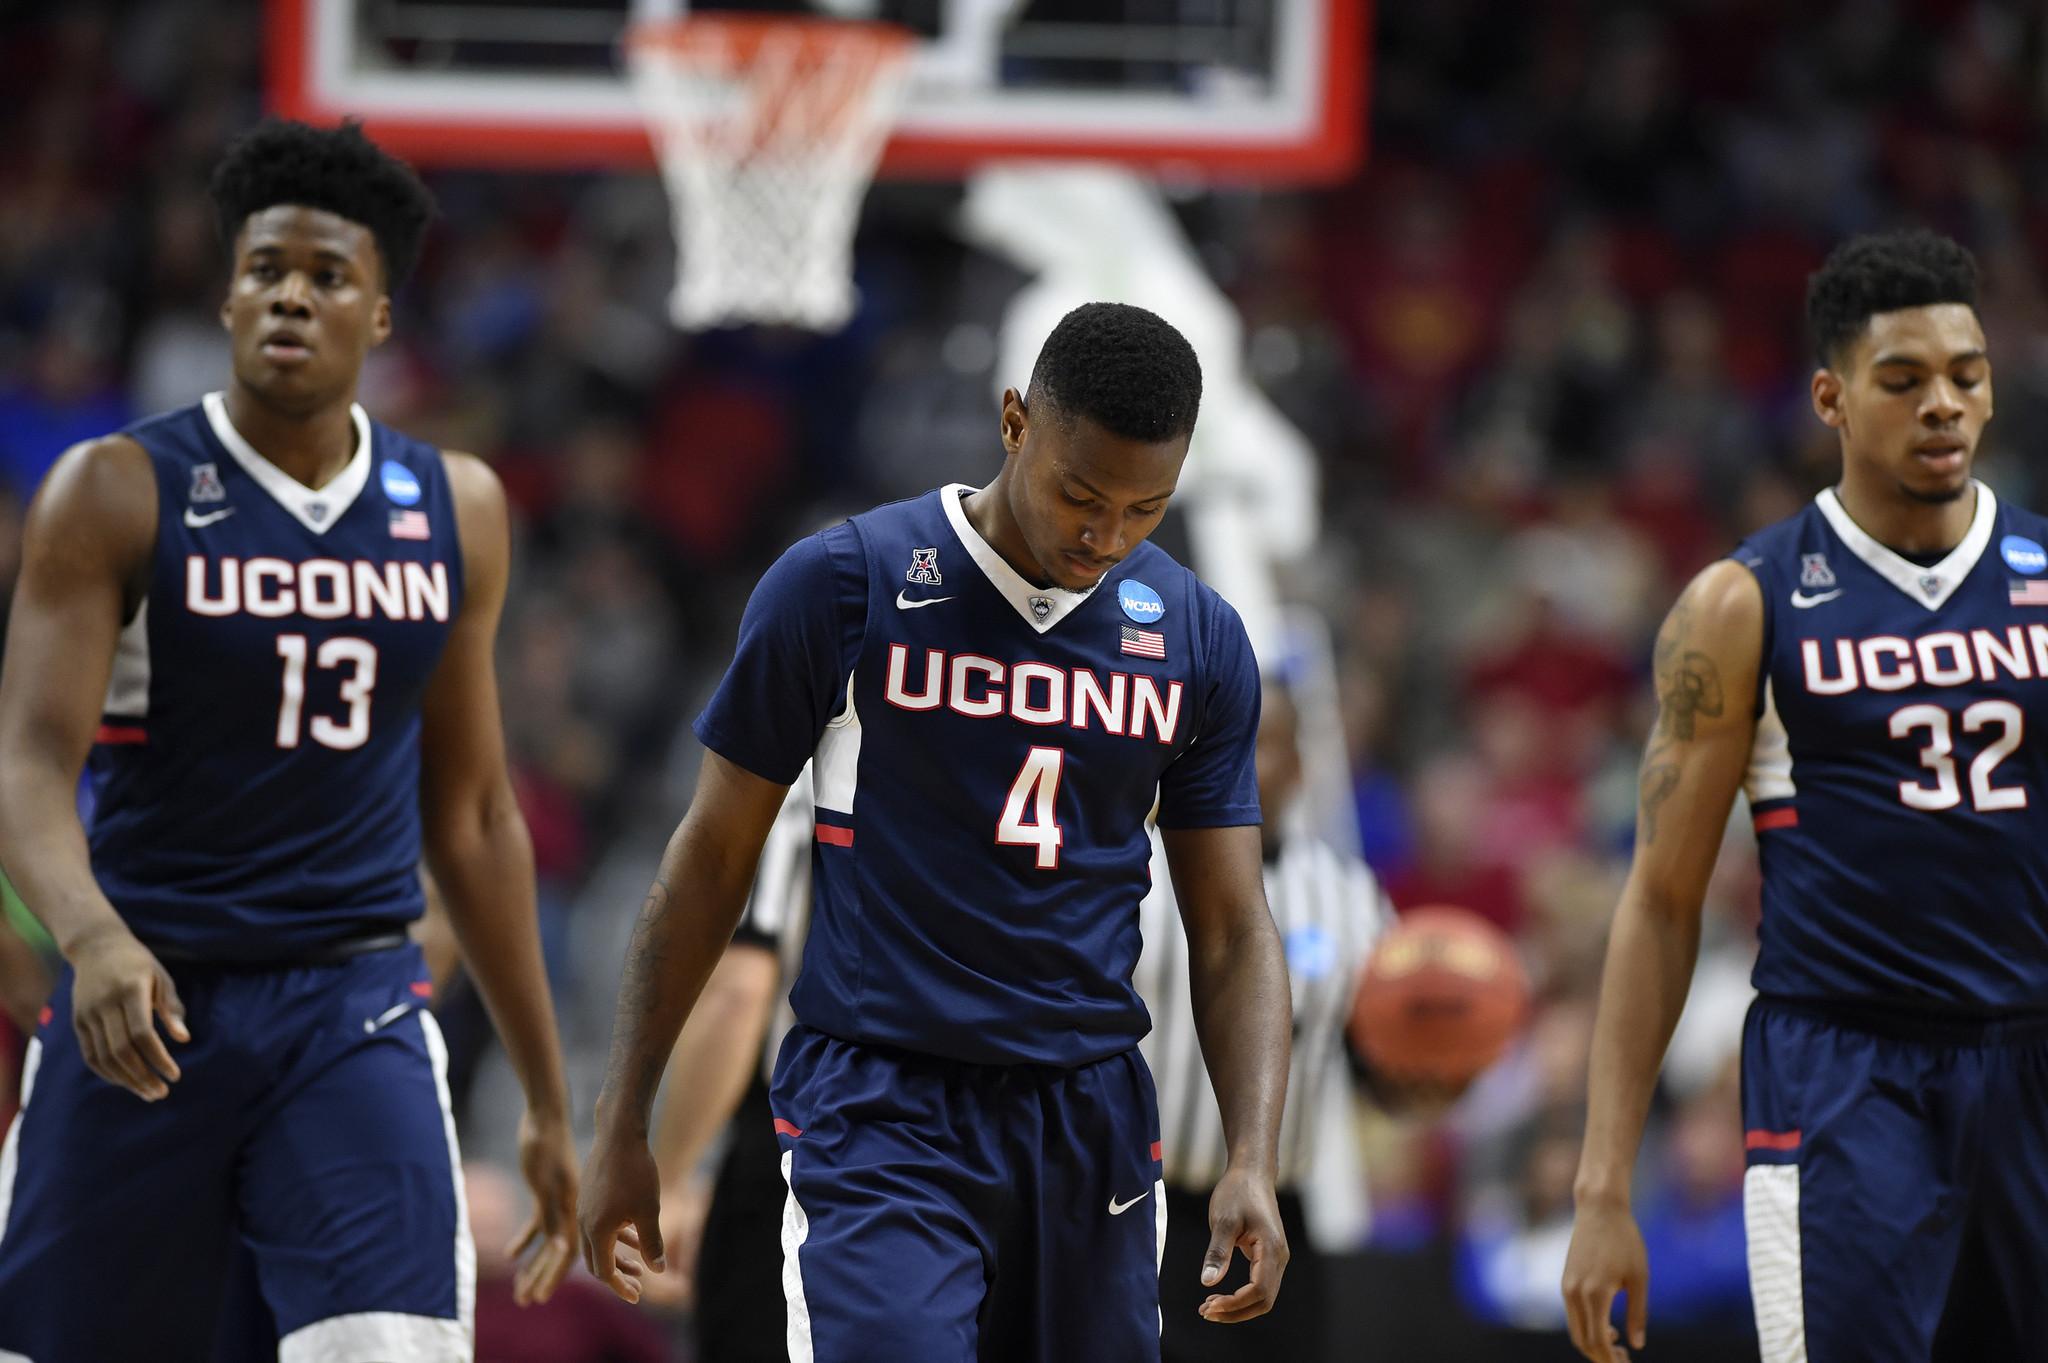 Hc-uconn-men-basketball-notes-0629-20160628